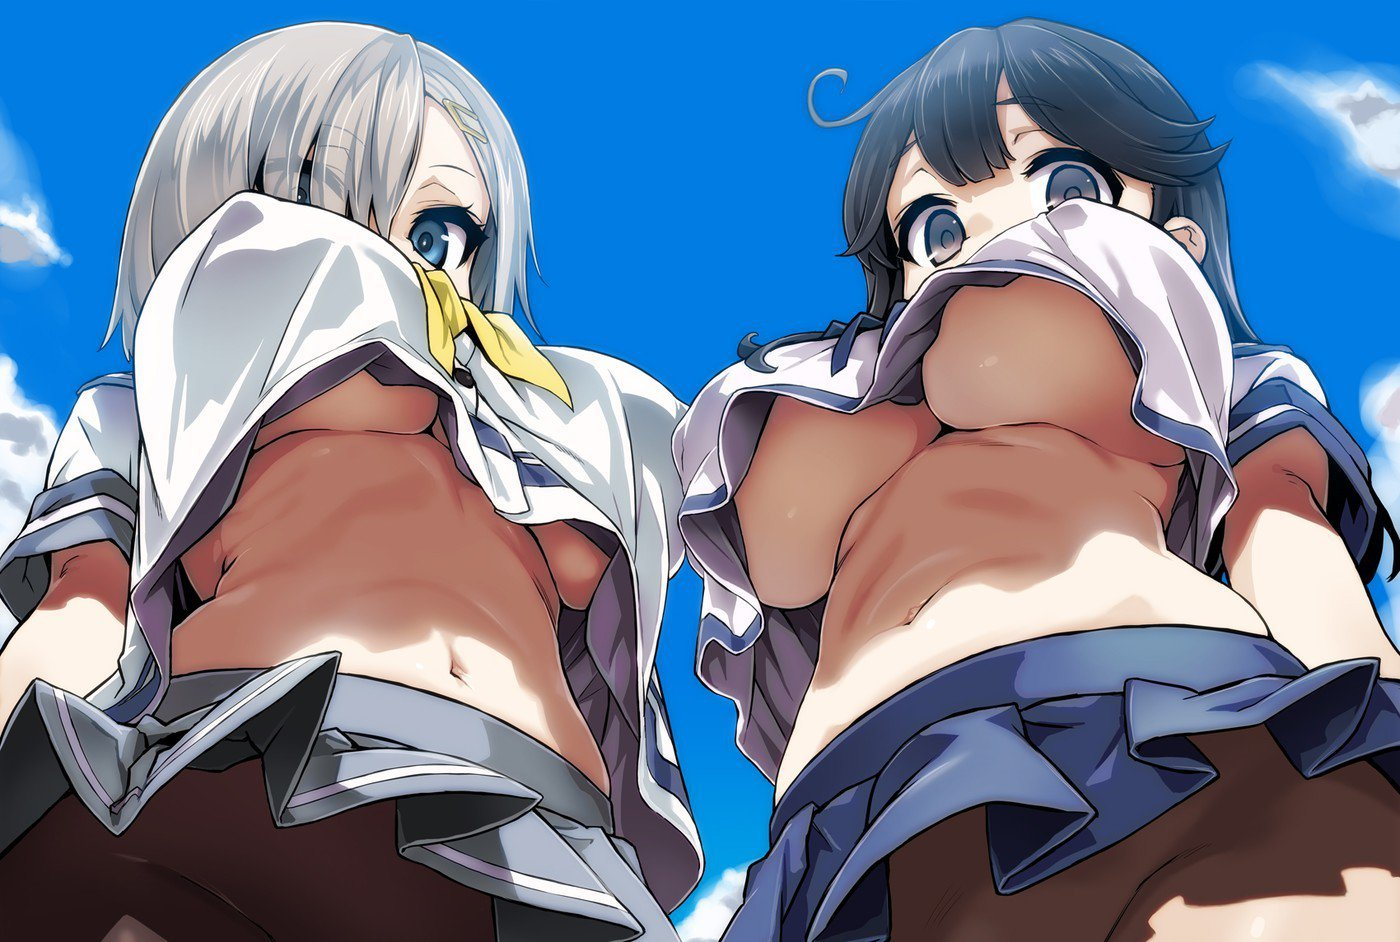 Anime epic seks resimleri sex photo